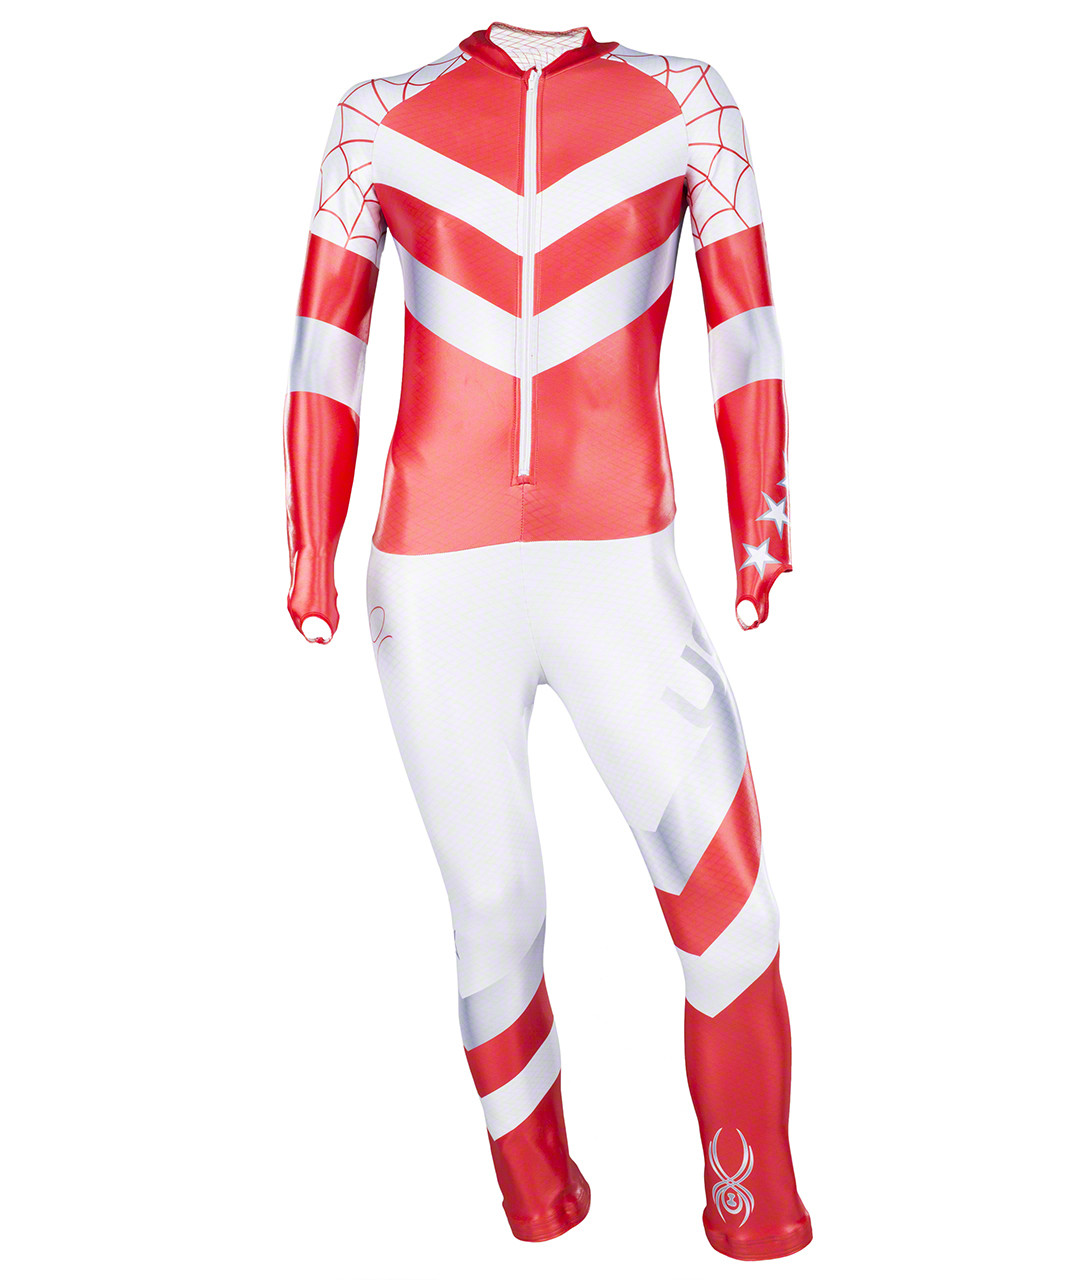 Spyder Kids Race Suit